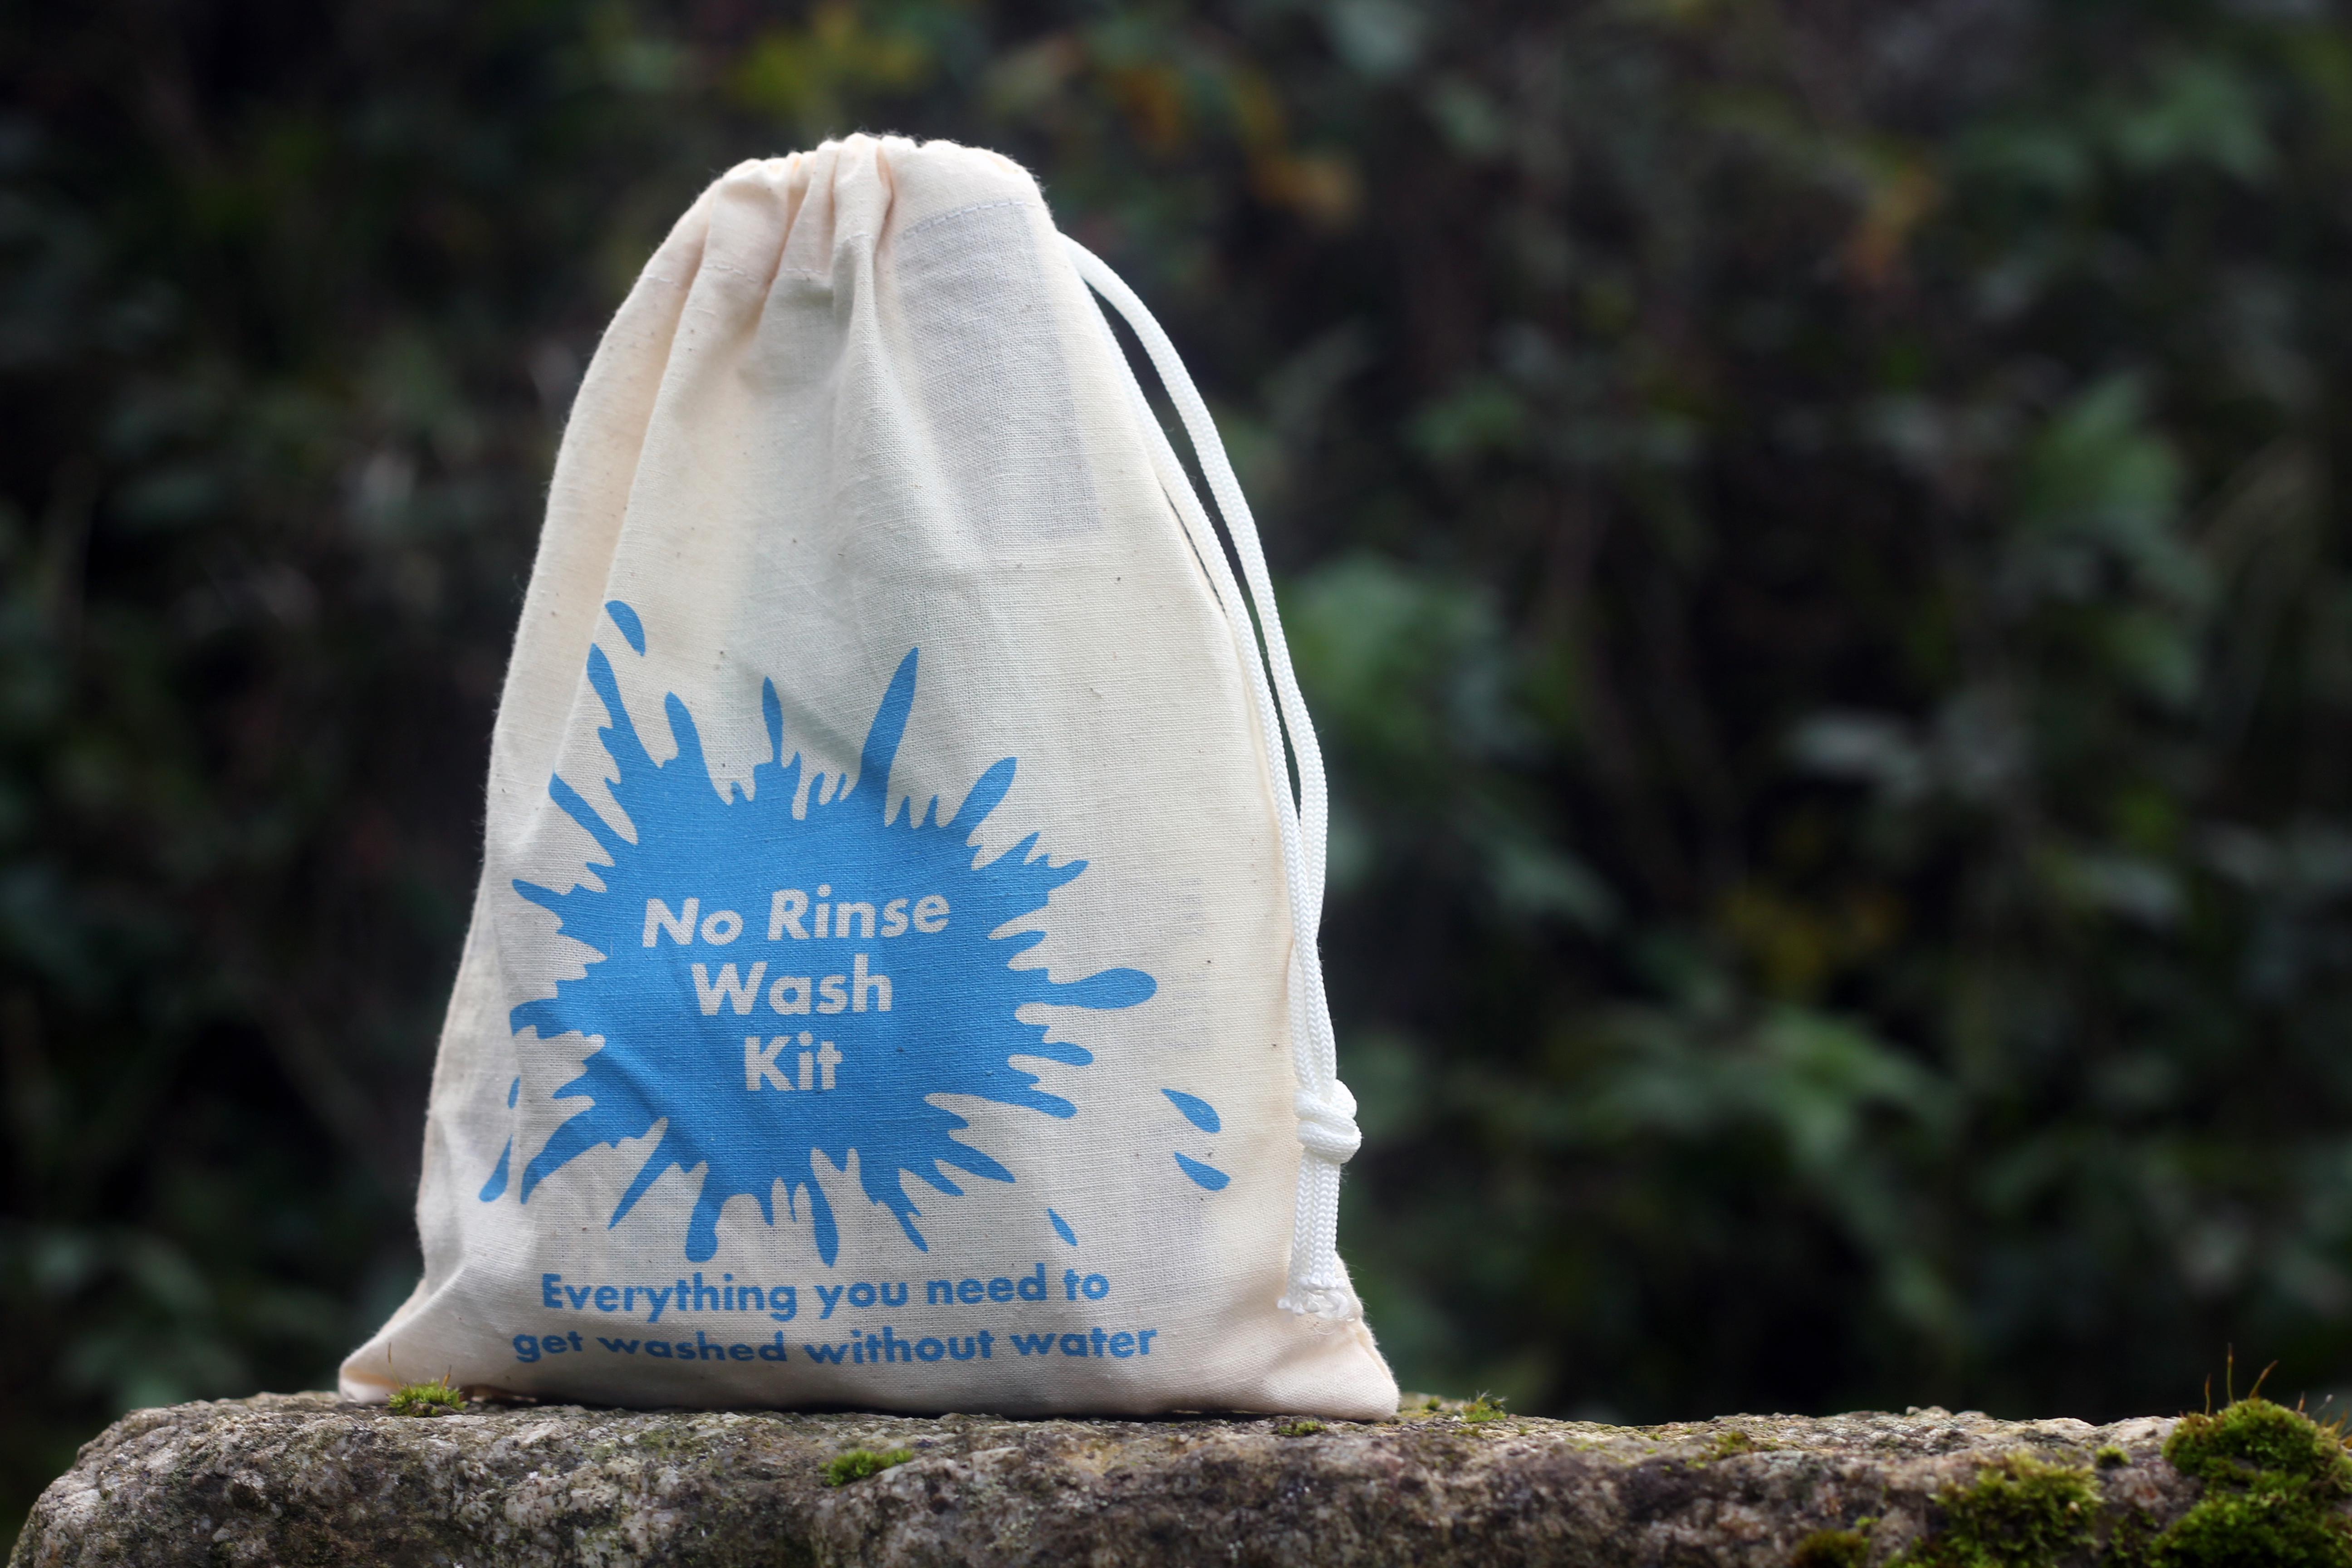 Wash kit bag